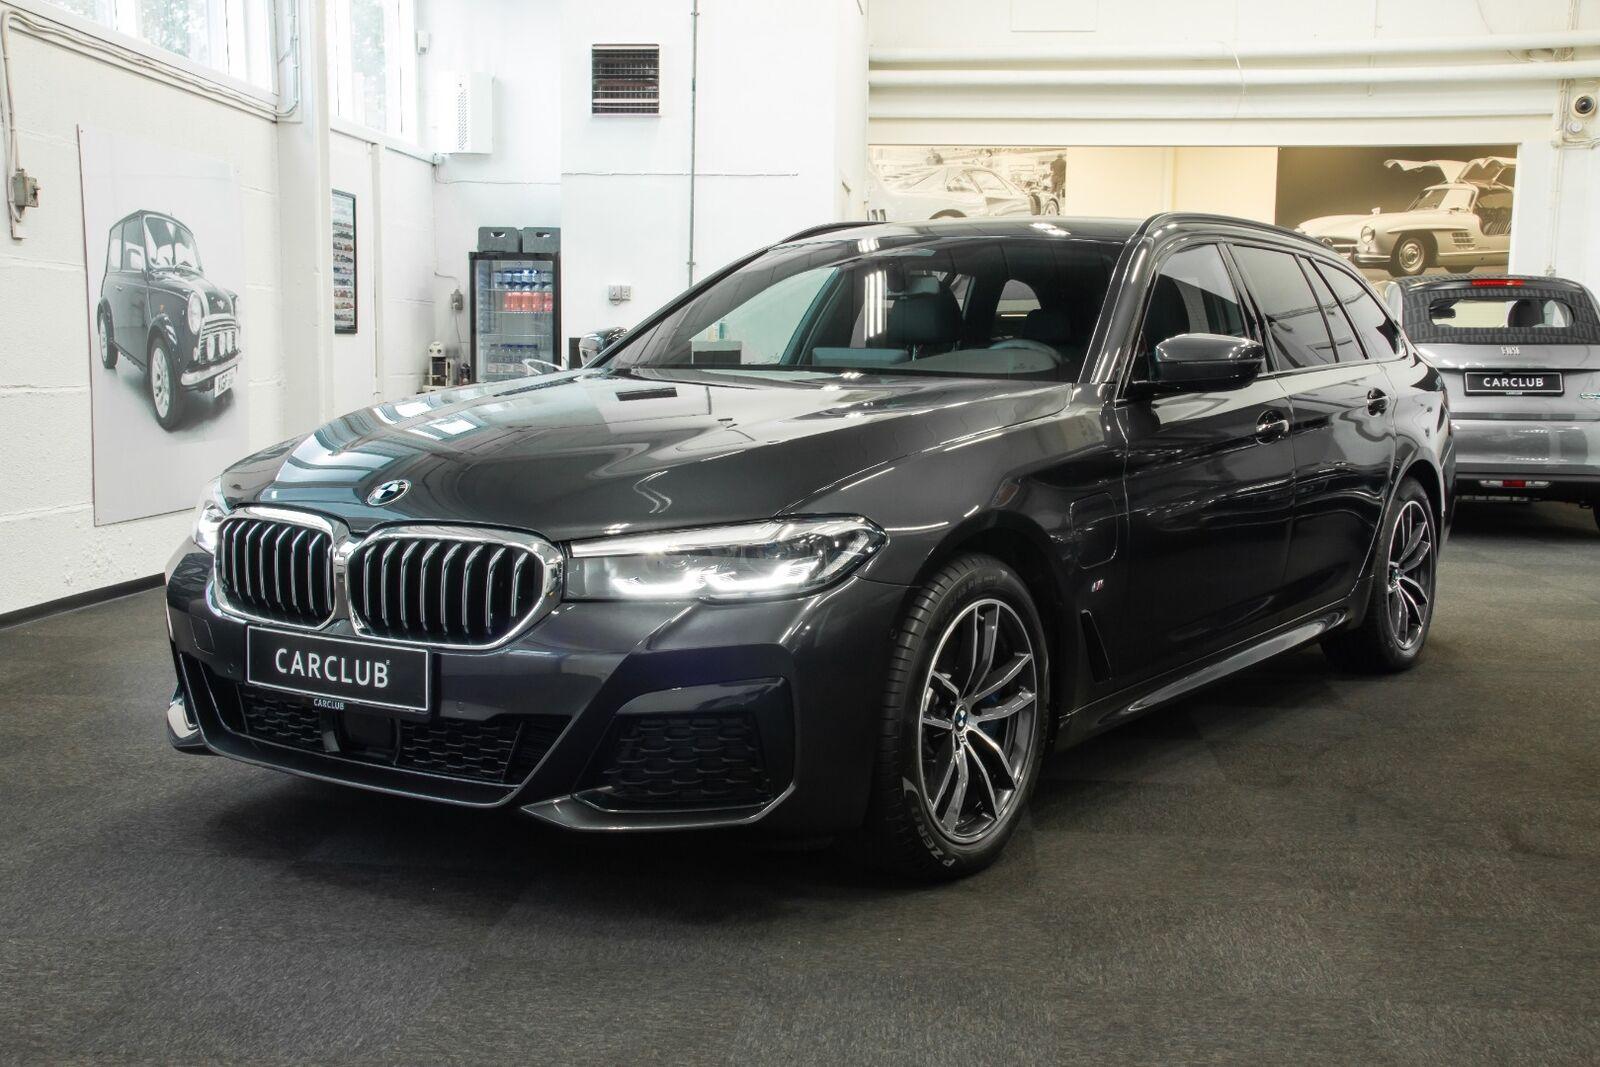 BMW 530e 2,0 Touring M-Sport+ xDrive aut. 5d - 679.900 kr.